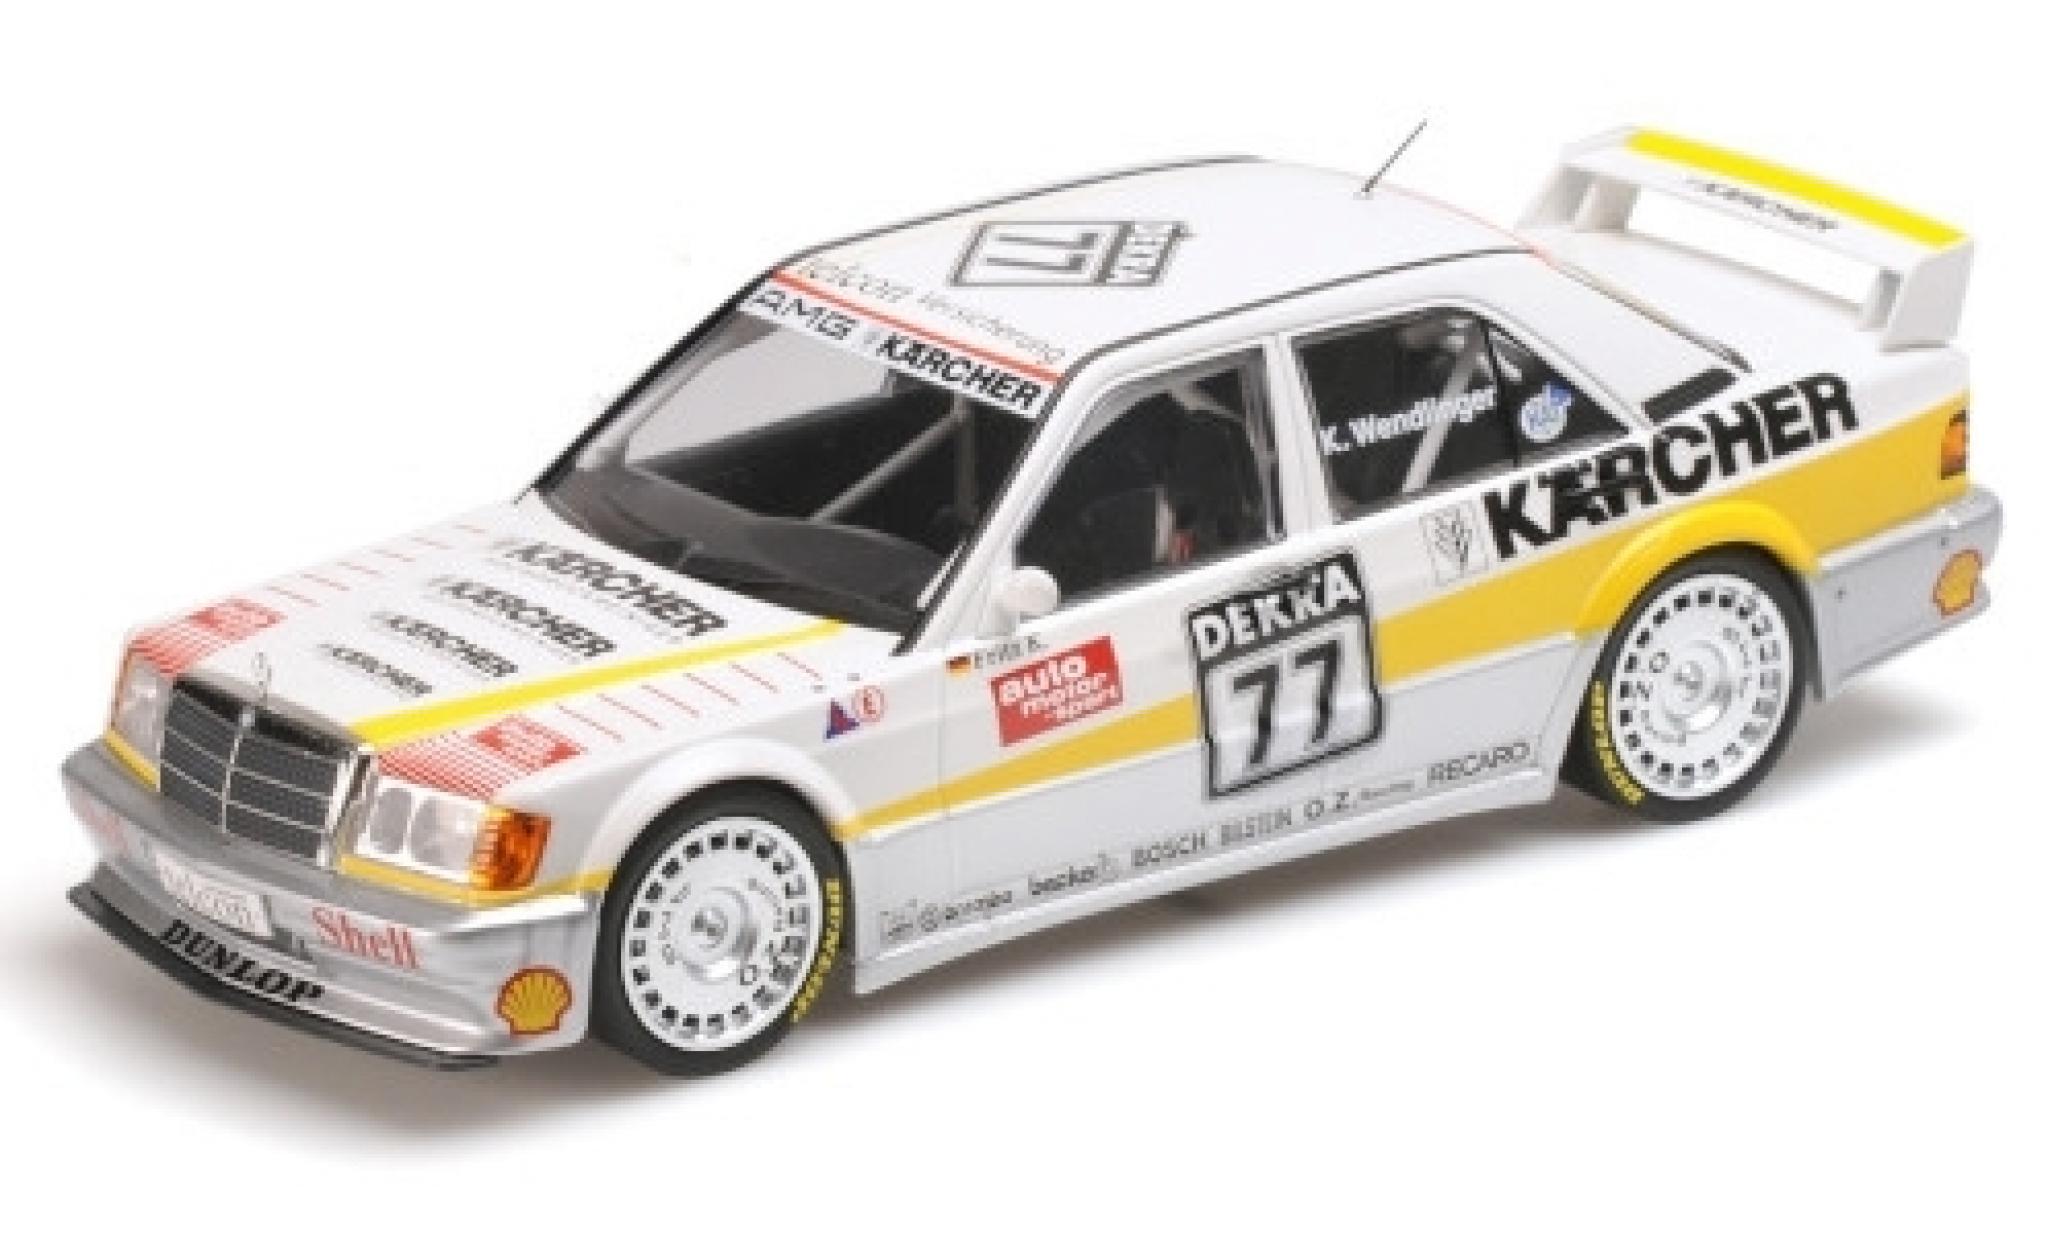 Mercedes 190 1/18 Minichamps E 2.5-16 EVO 1 No.77 Team AMG- Kärcher DTM 1989 F.Kreuzpointner